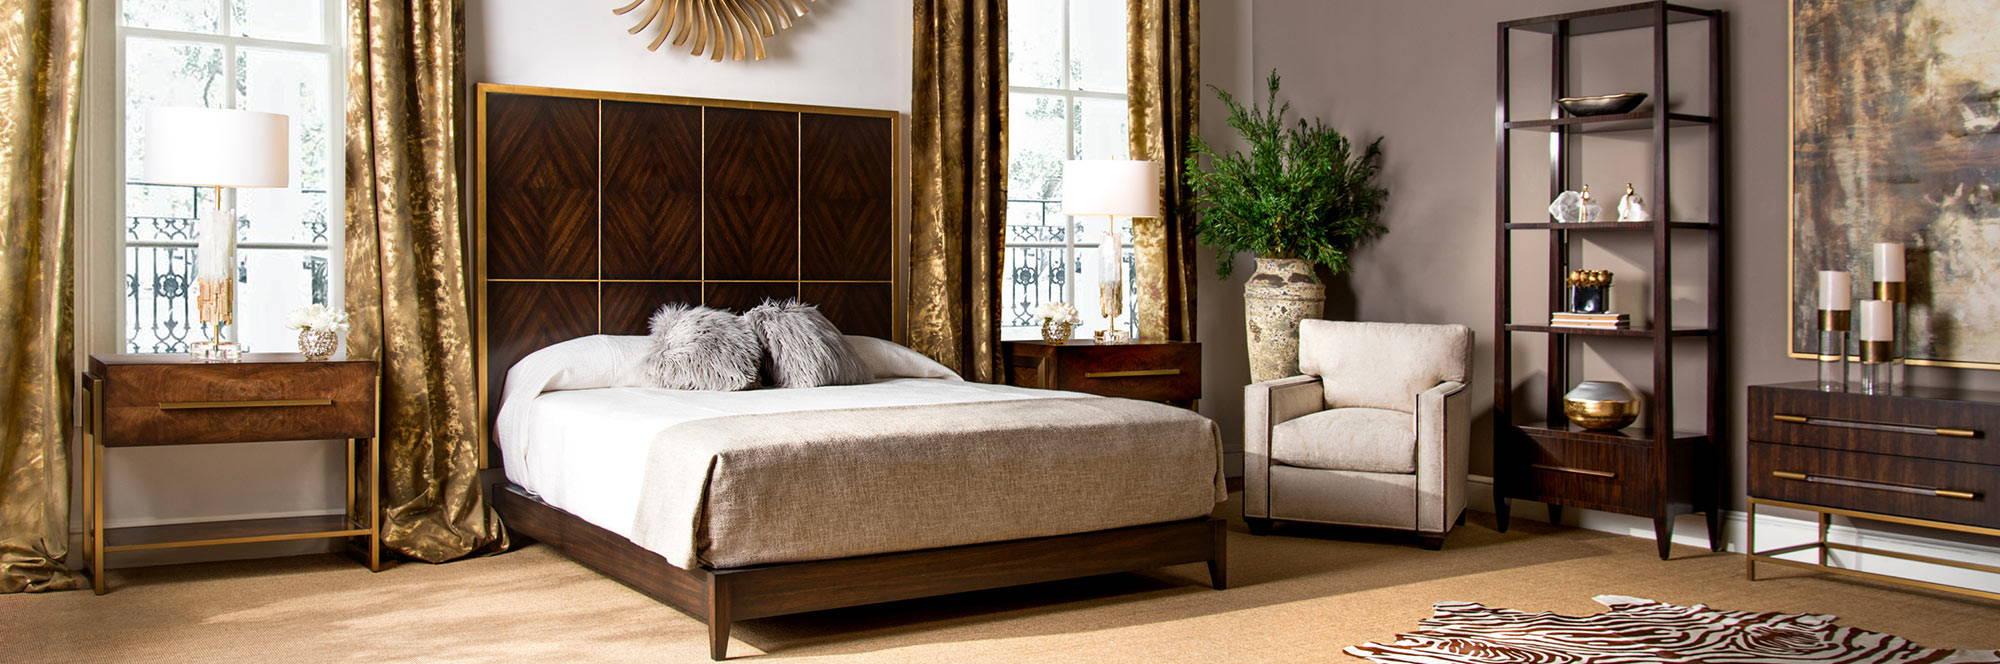 John-Richard Furniture & Home Accessories - Bedroom Scheme - LuxDeco.com